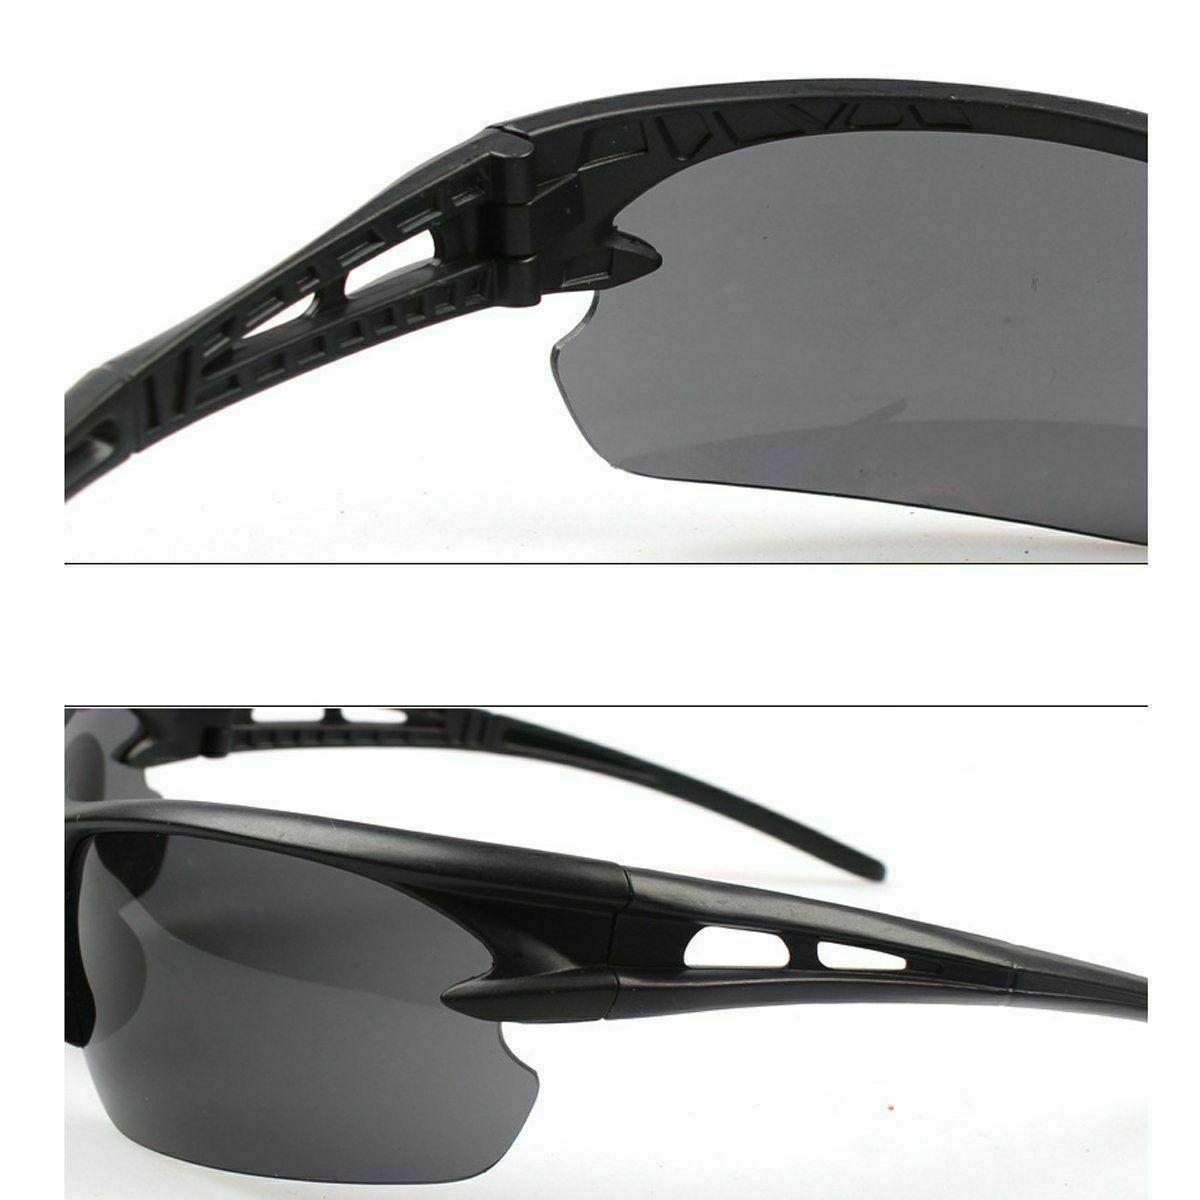 New Day Night Vision Sunglasses UV400 Glasses Unisex Eyewear